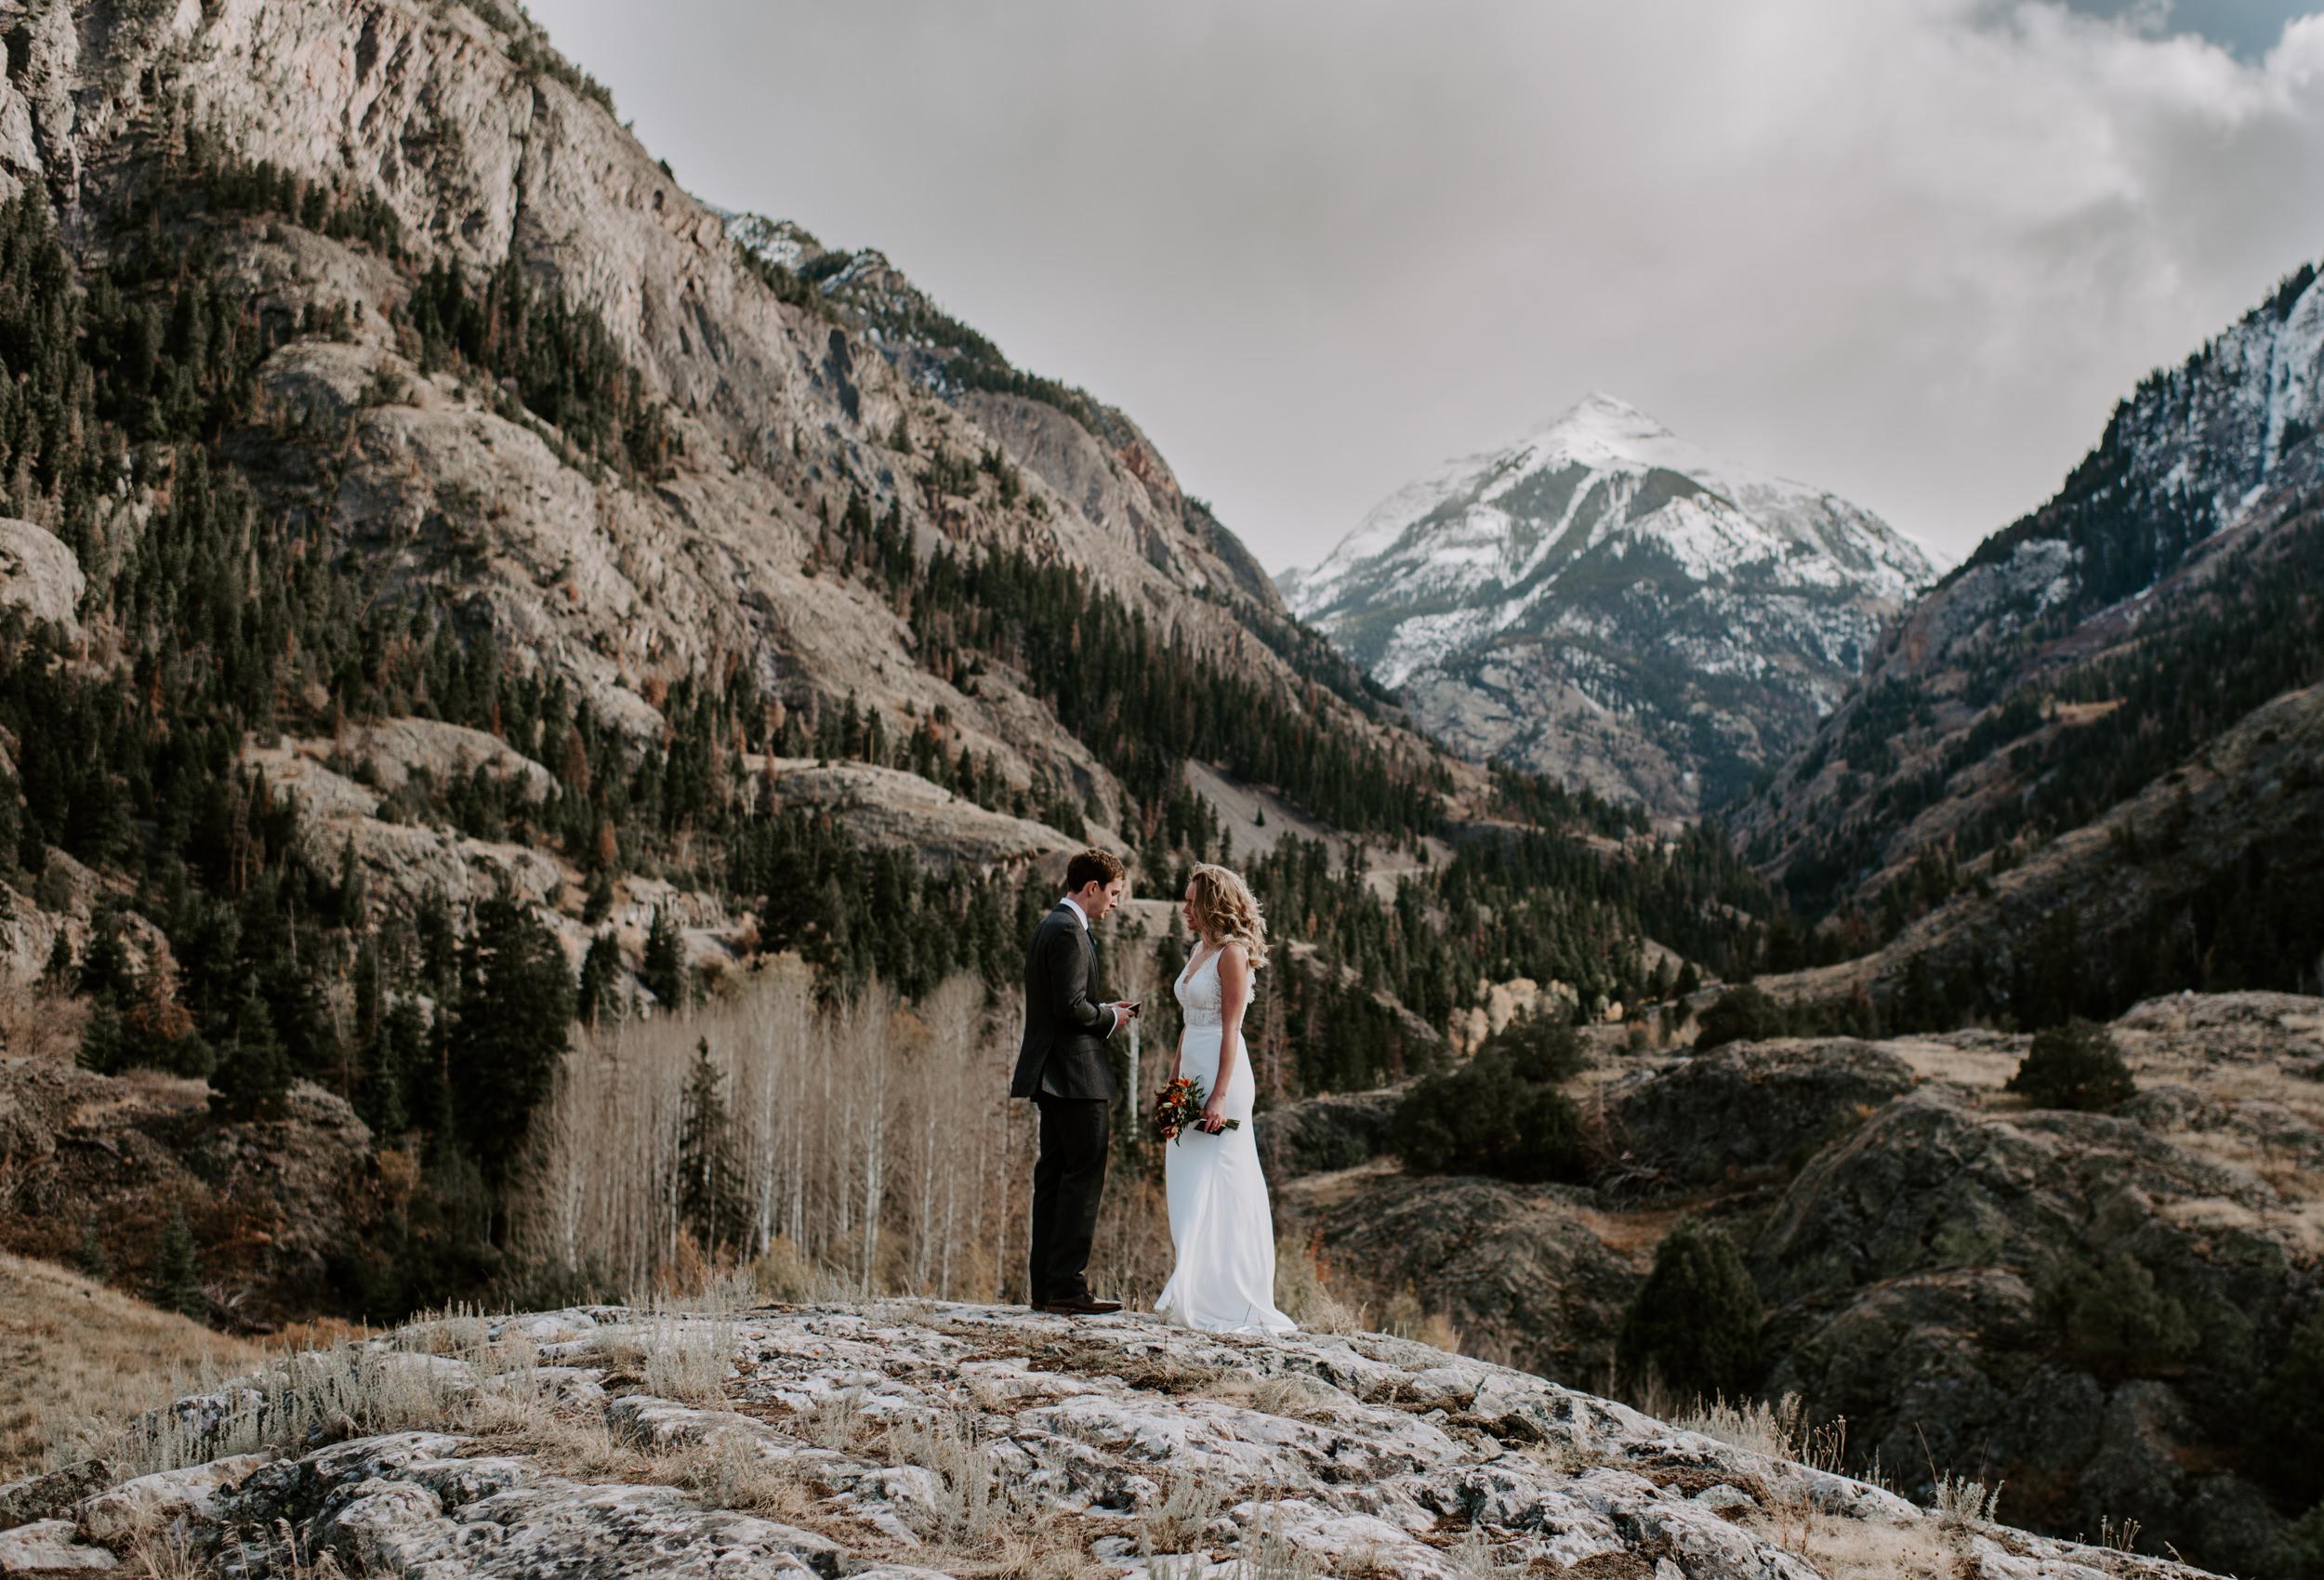 Wedding ceremony in Telluride, Colorado. Ouray elopement and wedding photographer. Colorado mountain elopement.